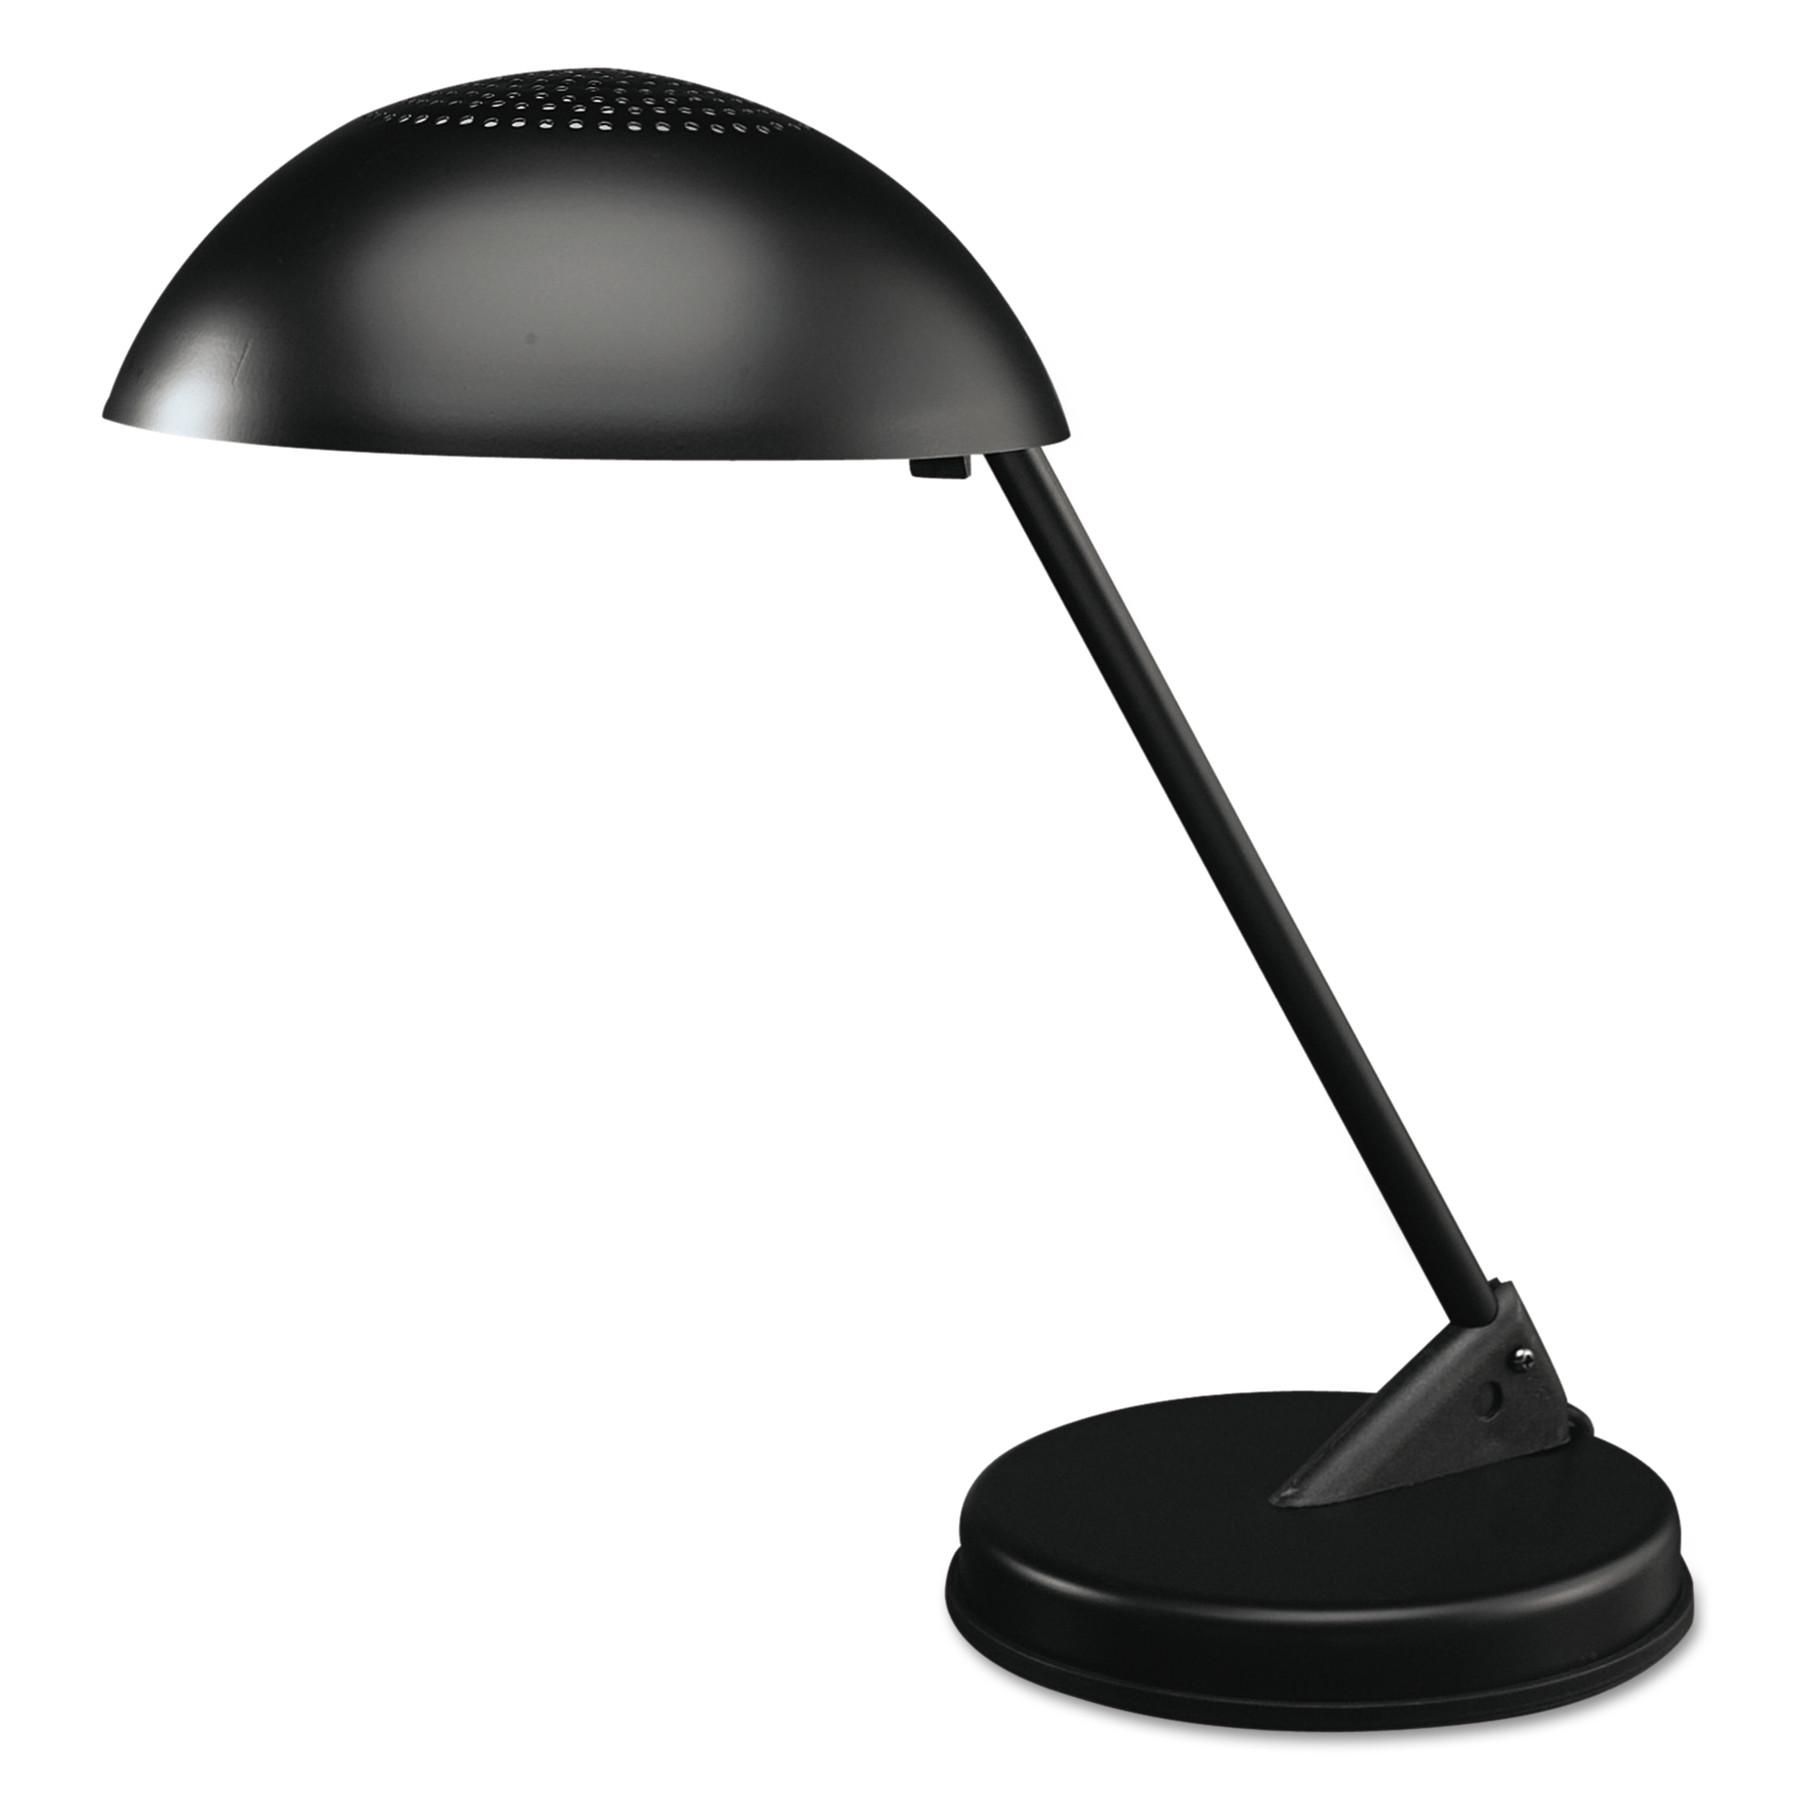 "Ledu Incandescent Desk Lamp with Vented Dome Shade, 18"" Reach, Matte Black by LEDU CORP."